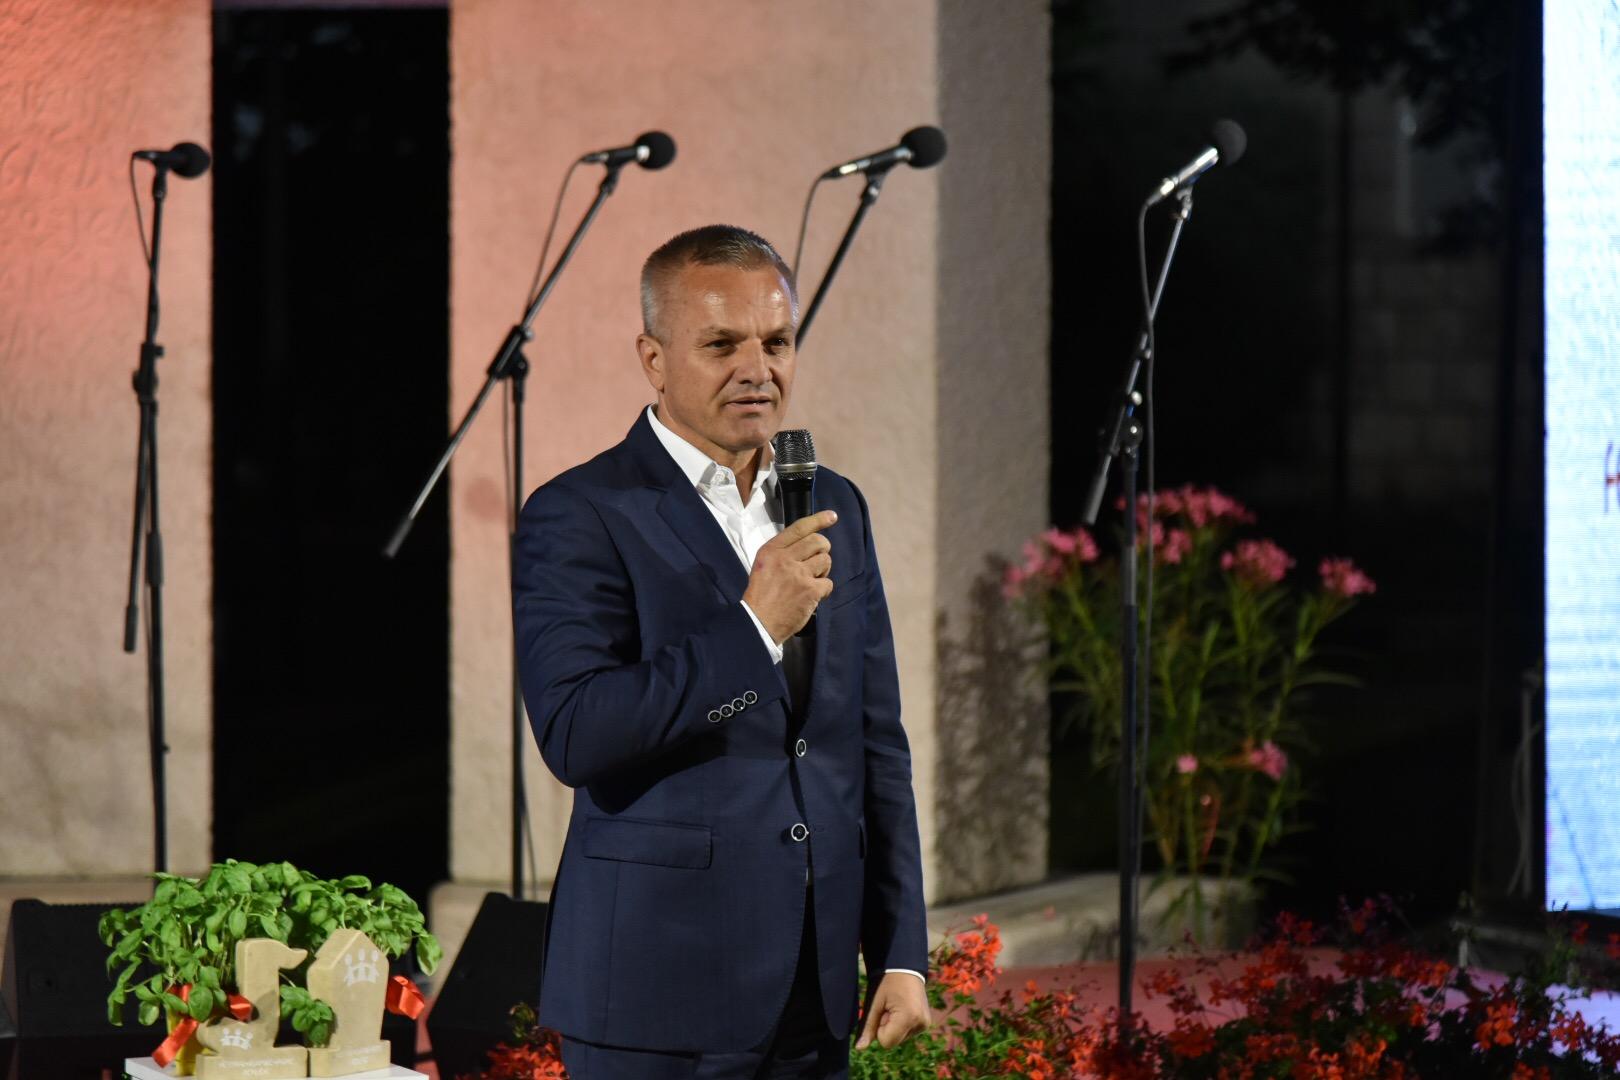 Milas: Suradnja s Hrvatima u BiH vanjskopolitički prioritet Hrvatske